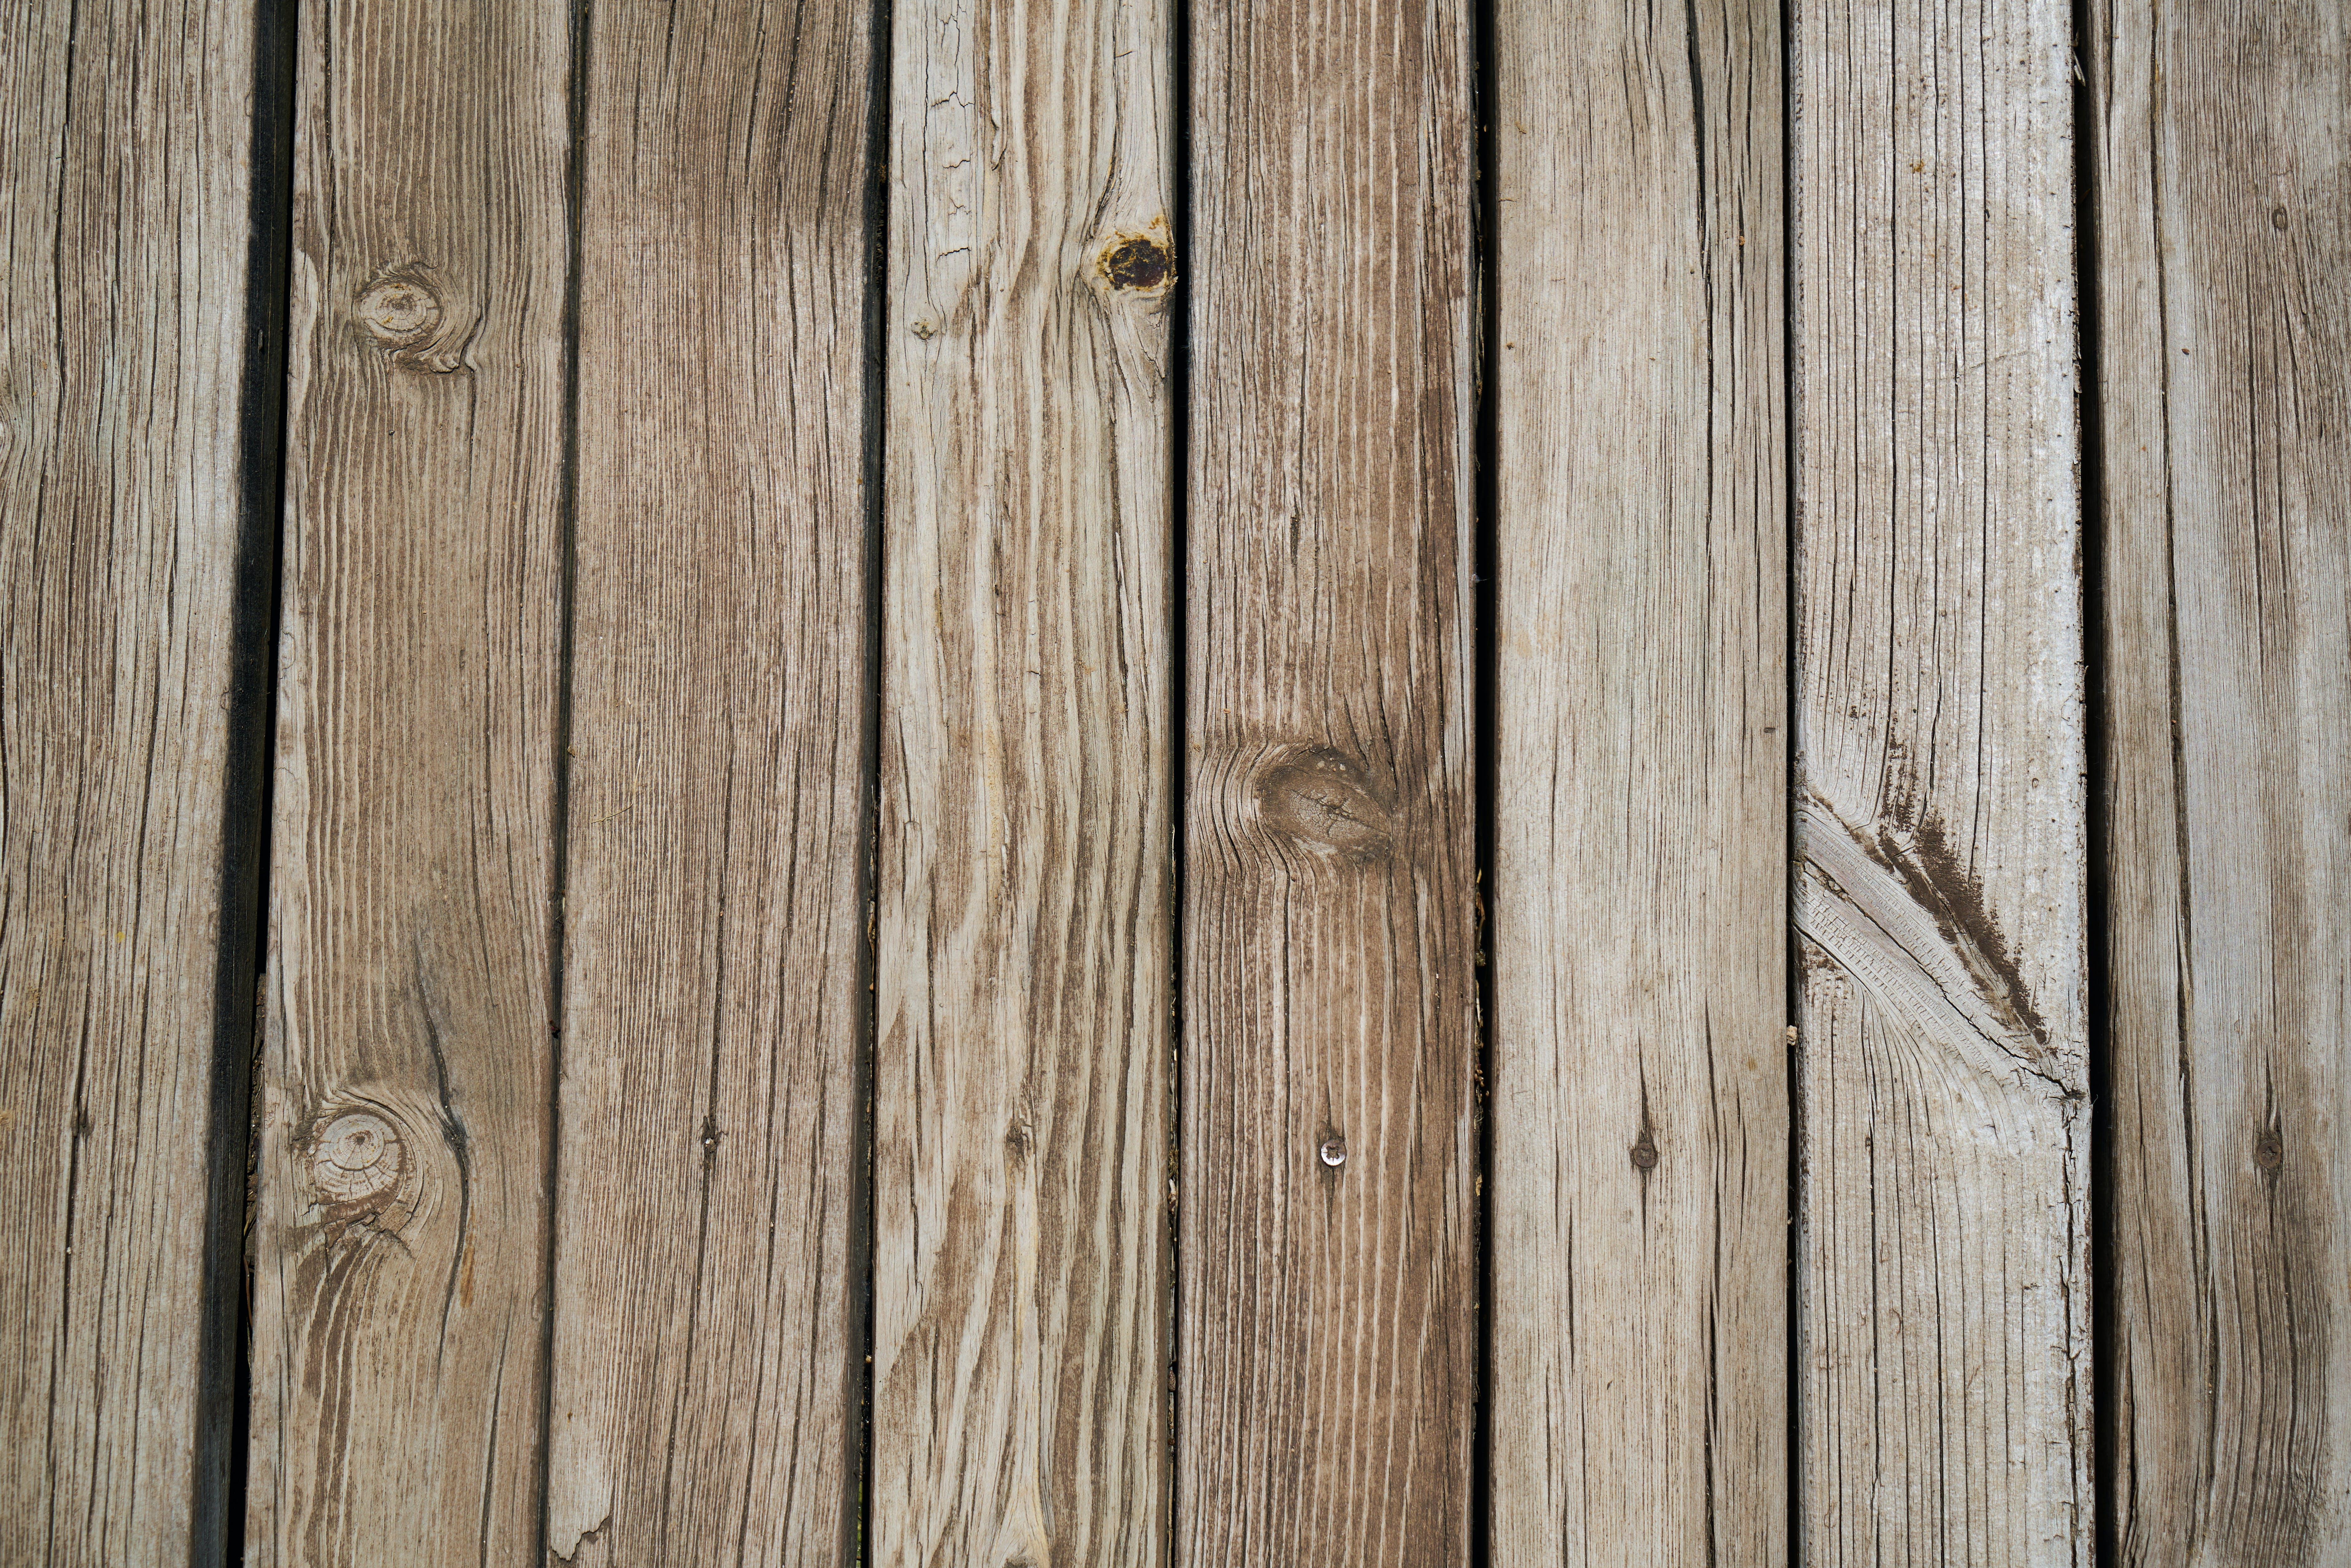 Kostnadsfri bild av 4k tapeter, barrved, grov, hårt träslag